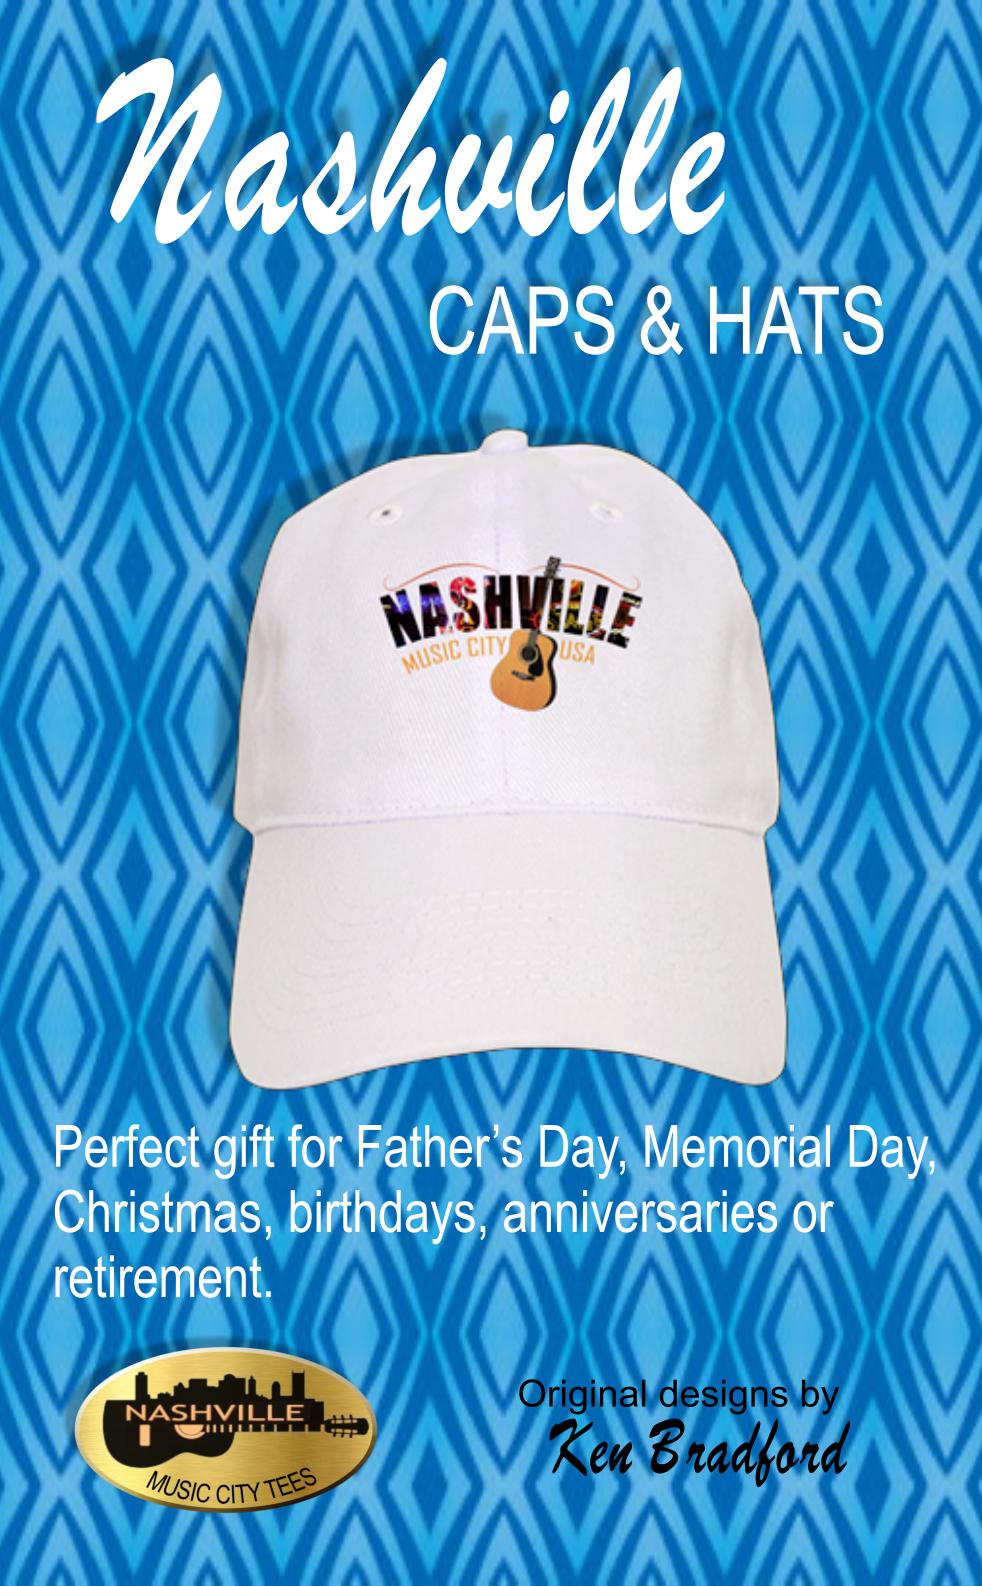 Nashville Music City Usa Baseball Cap A Vintage Nashville Tn Design To Celebrate Country Music In Music C Perfect Gift For Dad Music City Nashville Nashville